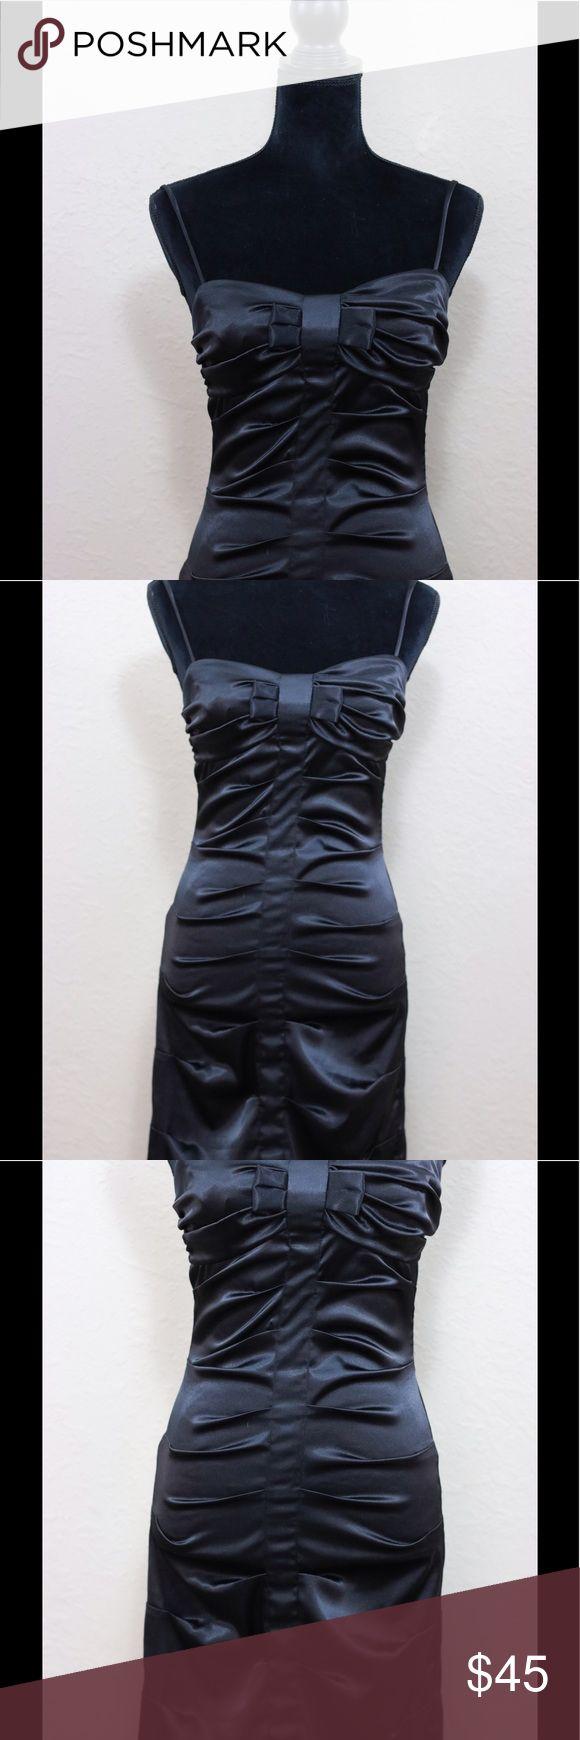 Taboo black bow bust mini cocktail dress 5/6 Pre-loved Taboo Dresses Mini